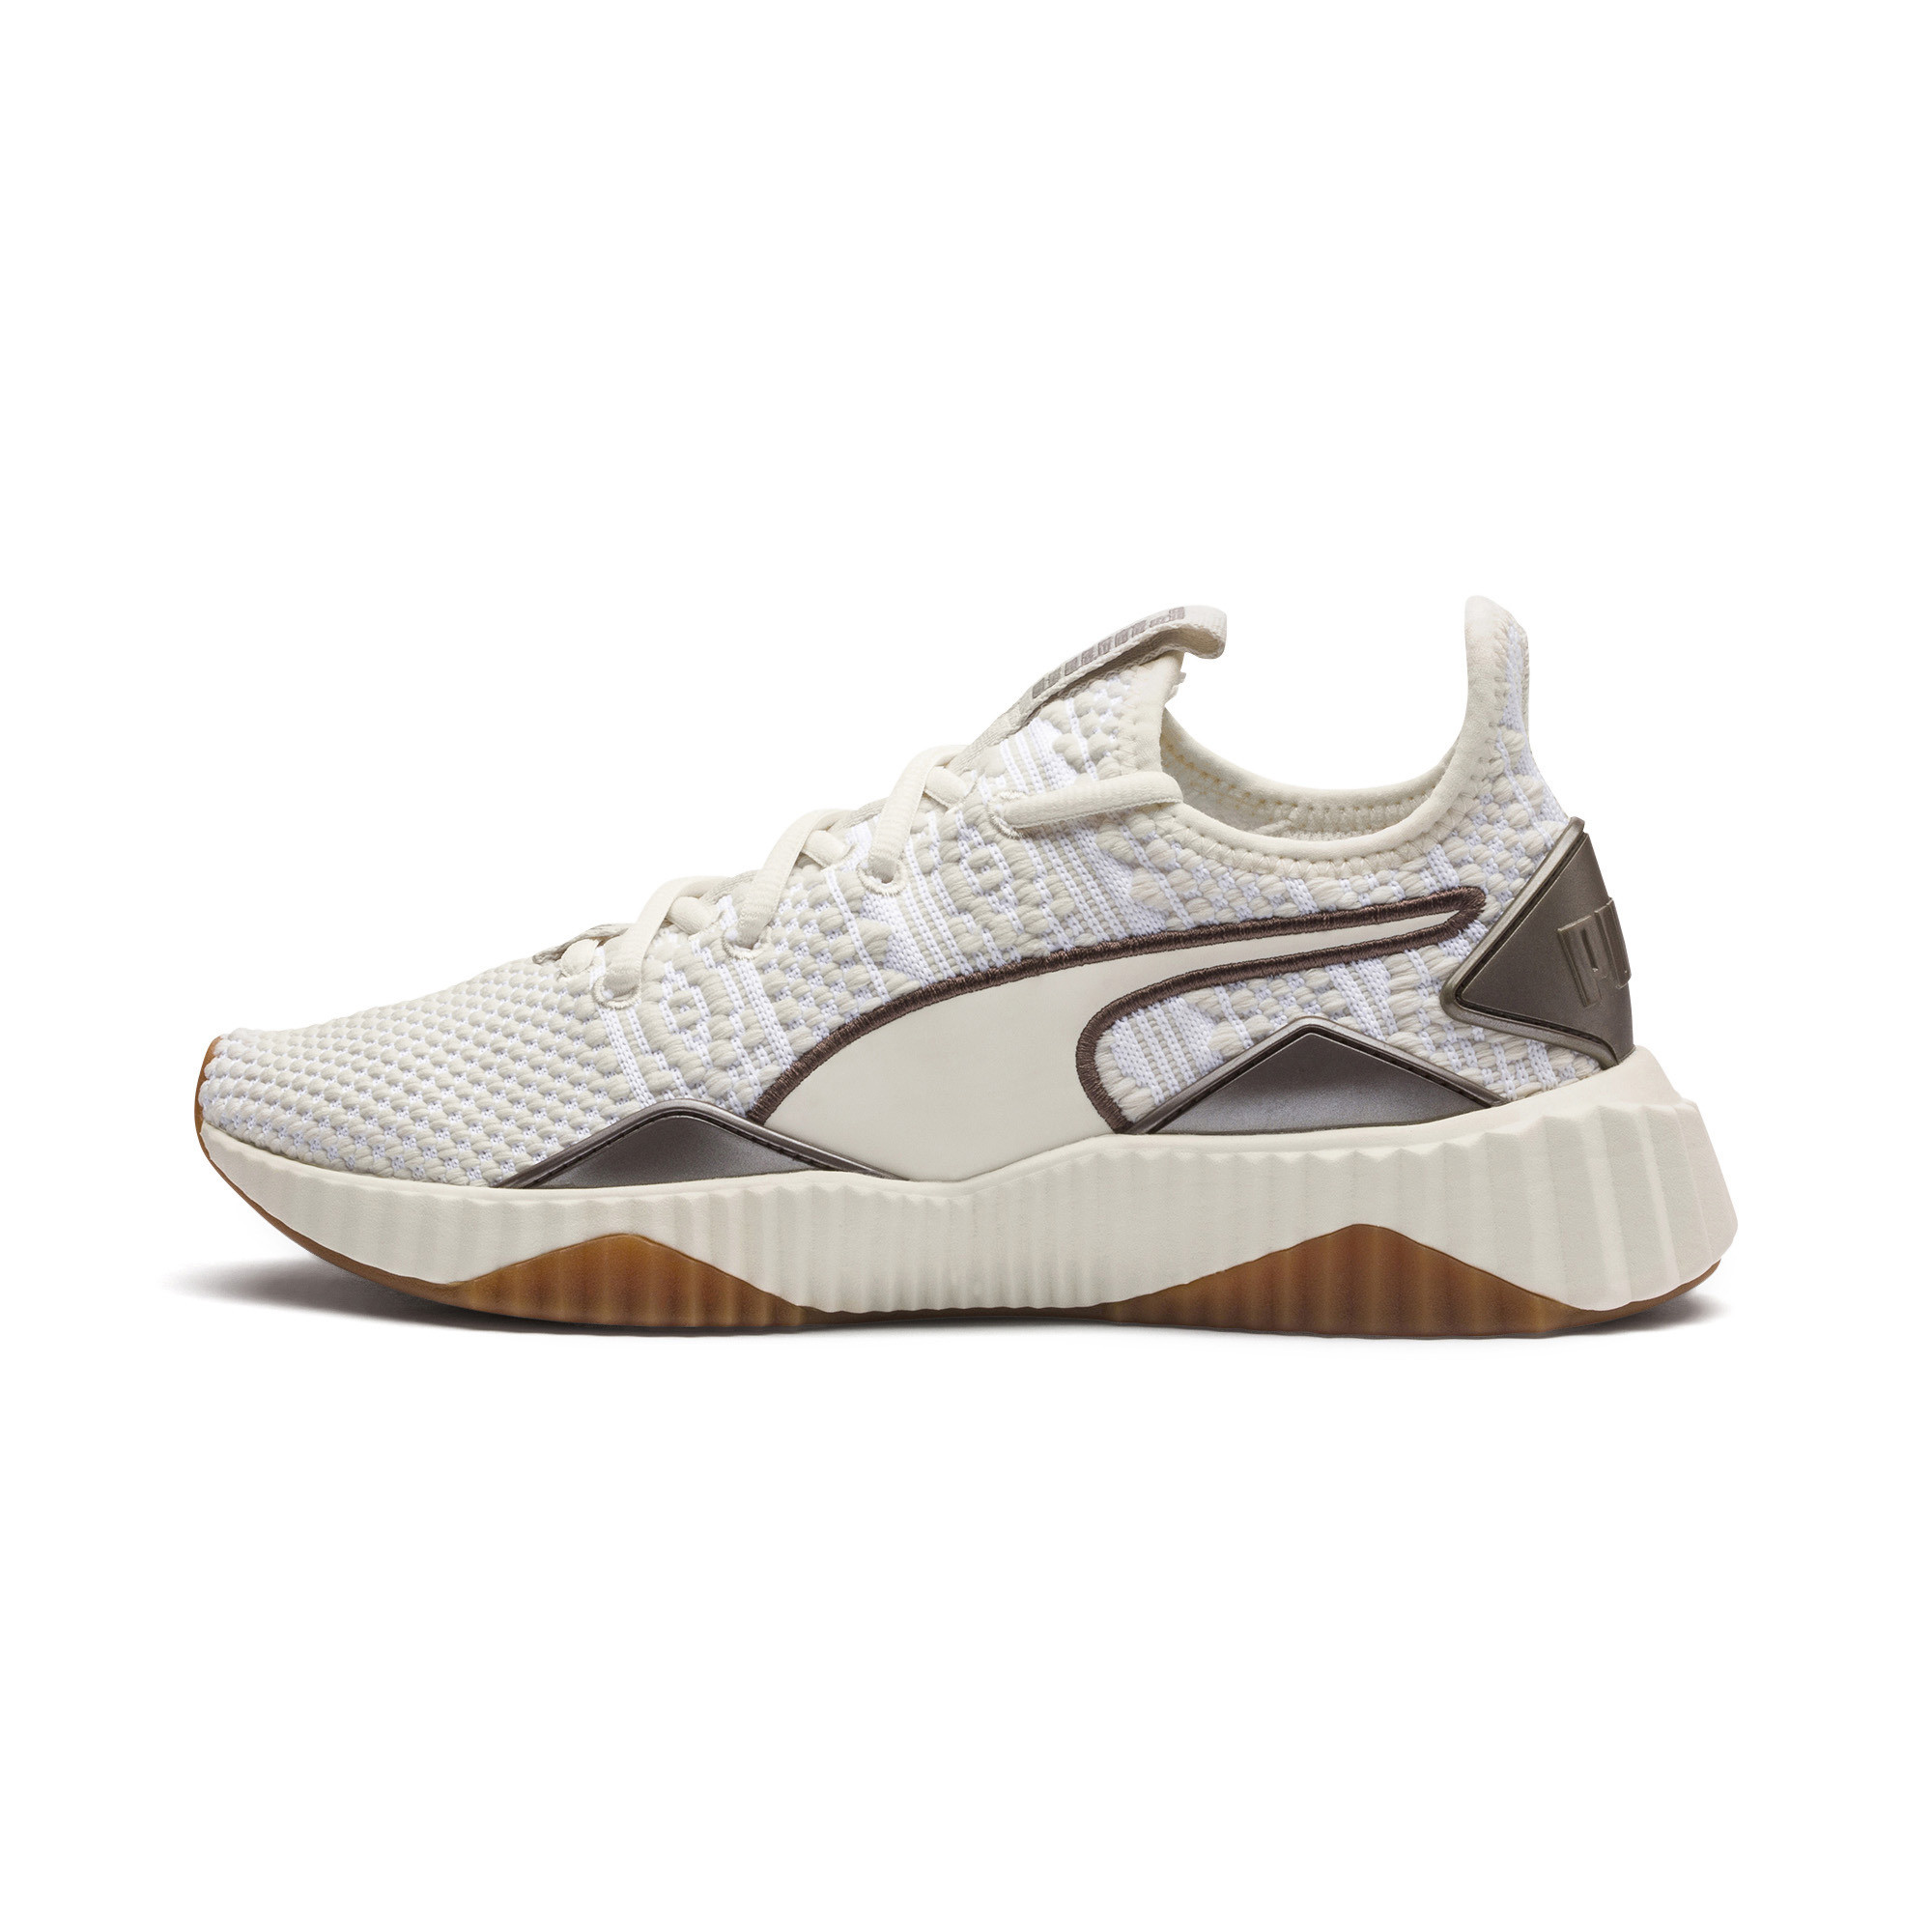 1d3b20fdd50 Women's Shoes, Sneakers, Wedges & Sandals   PUMA® Official Online Store